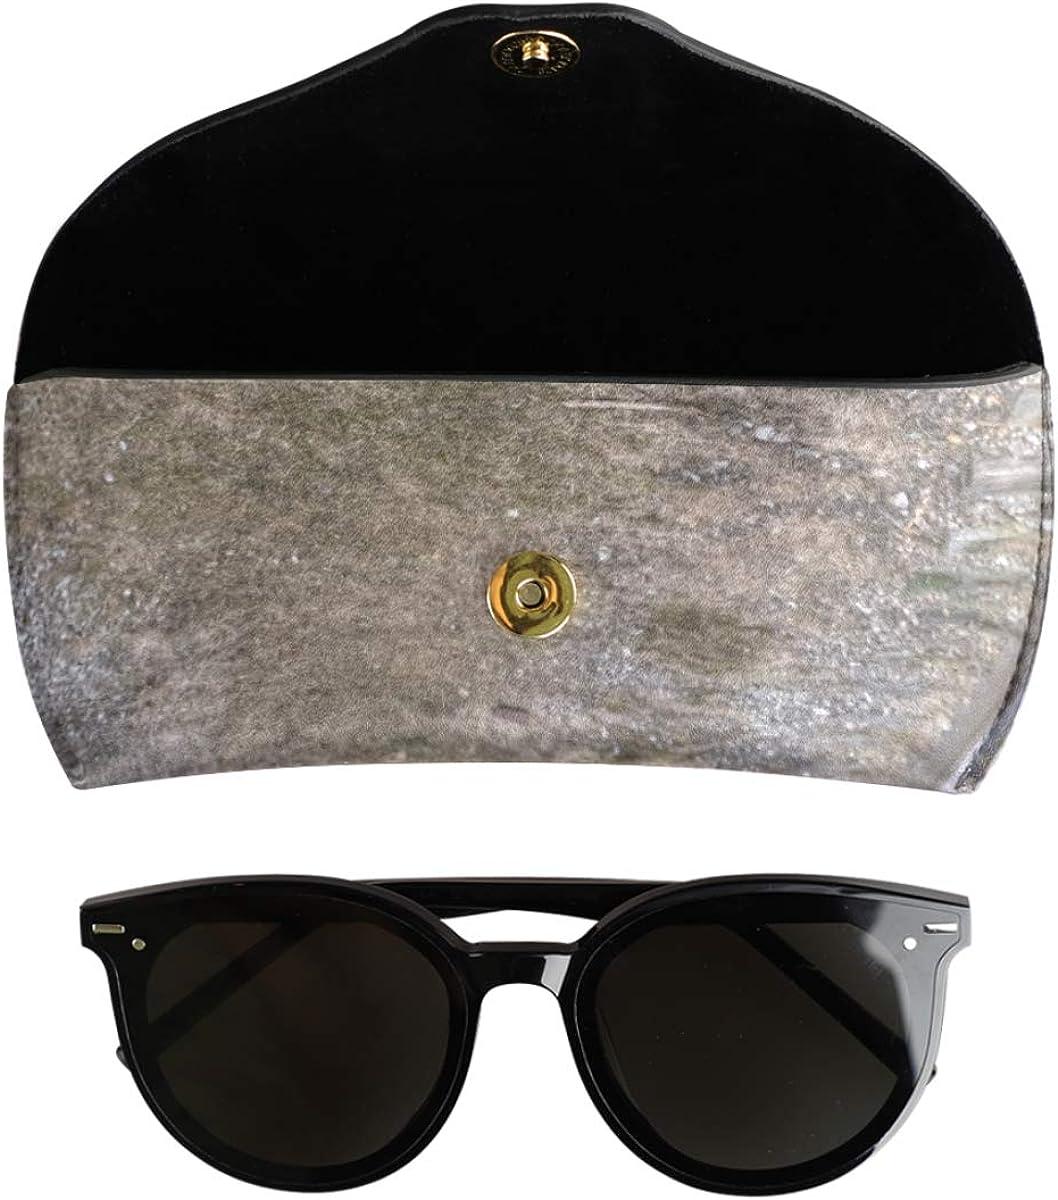 present Goggles Bag Sunglasses Case Eyeglasses Pouch Old Engine Train Portable PU Leather Multiuse